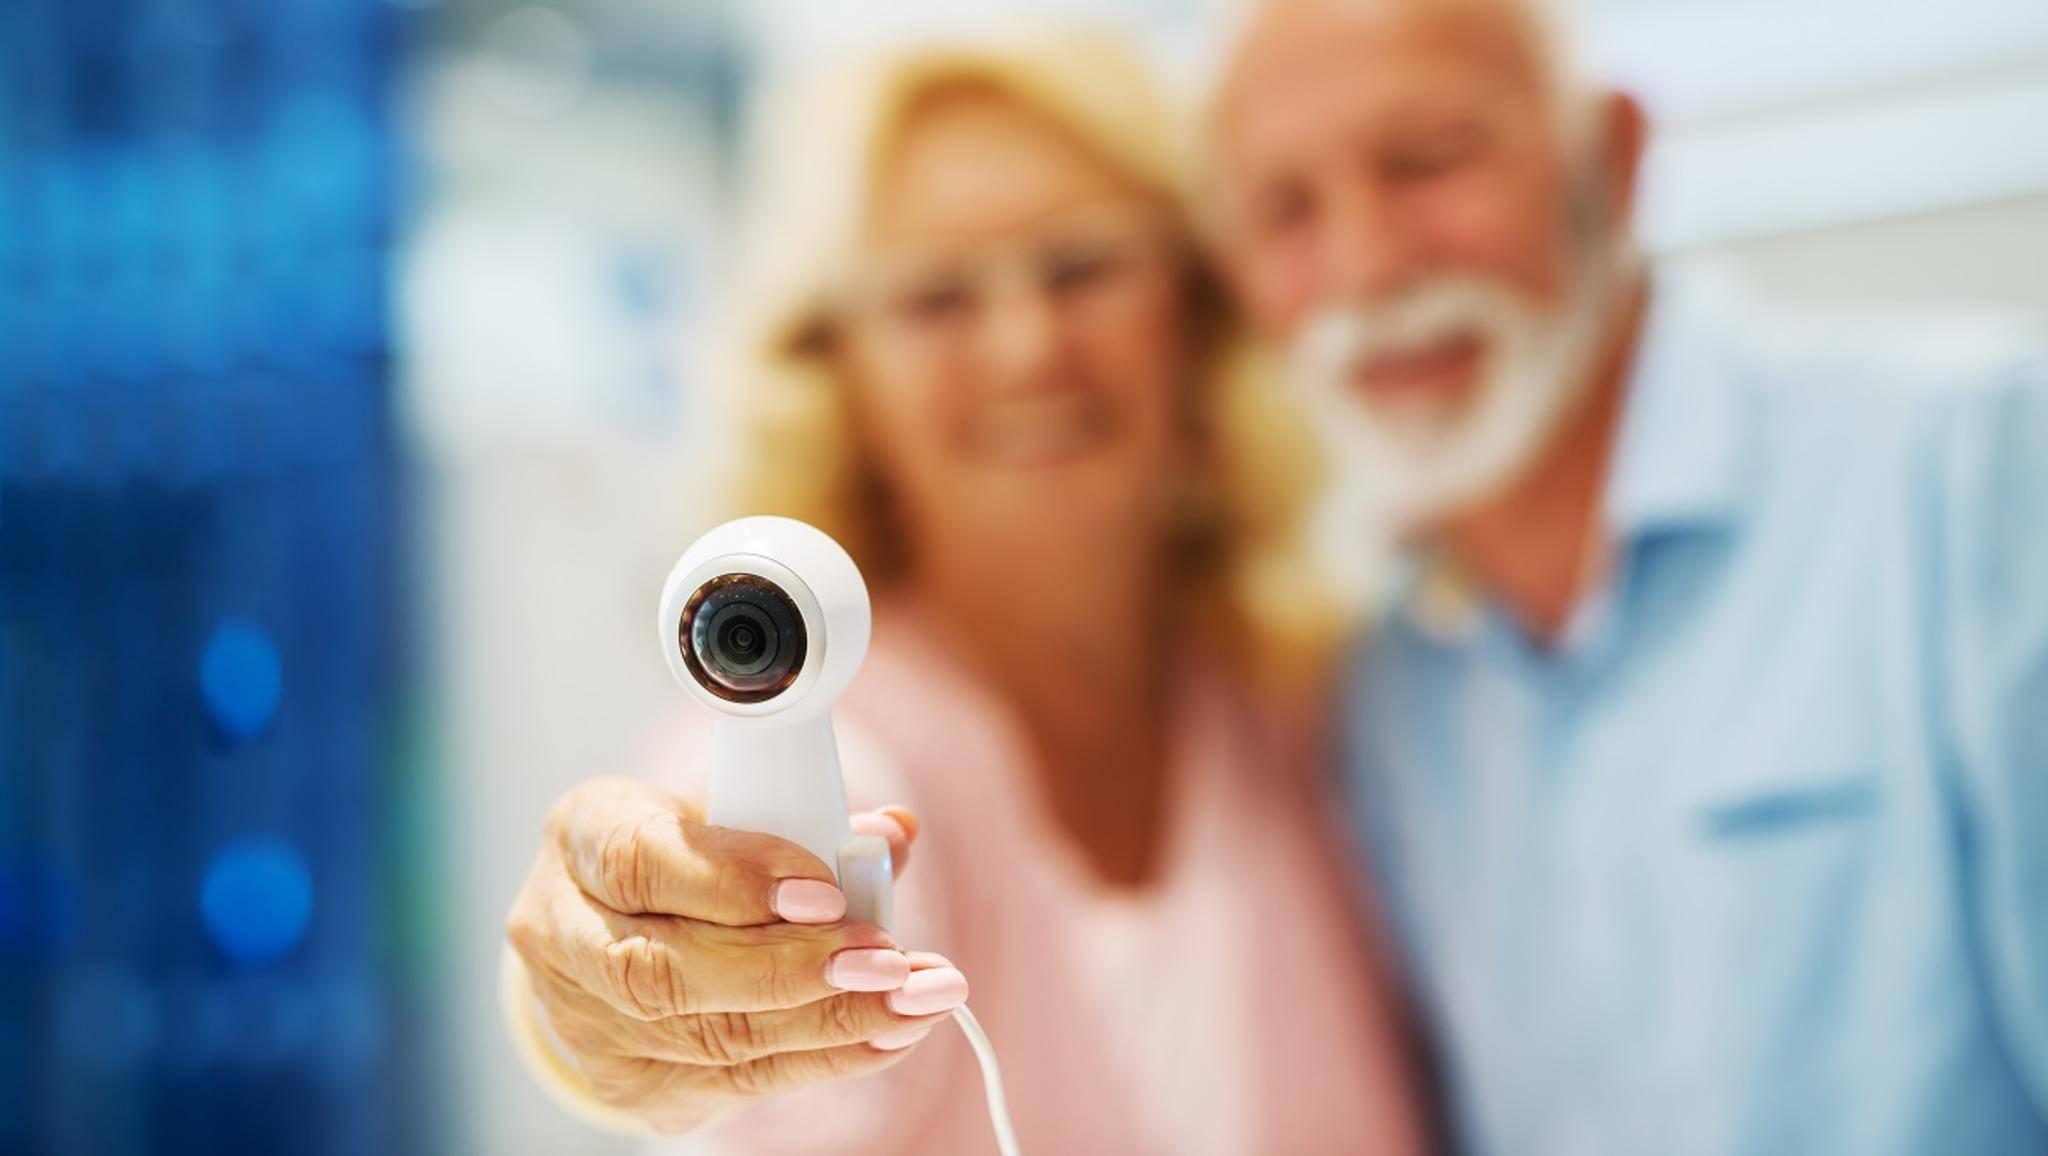 360-Grad-Kamera im Selfie-Modus